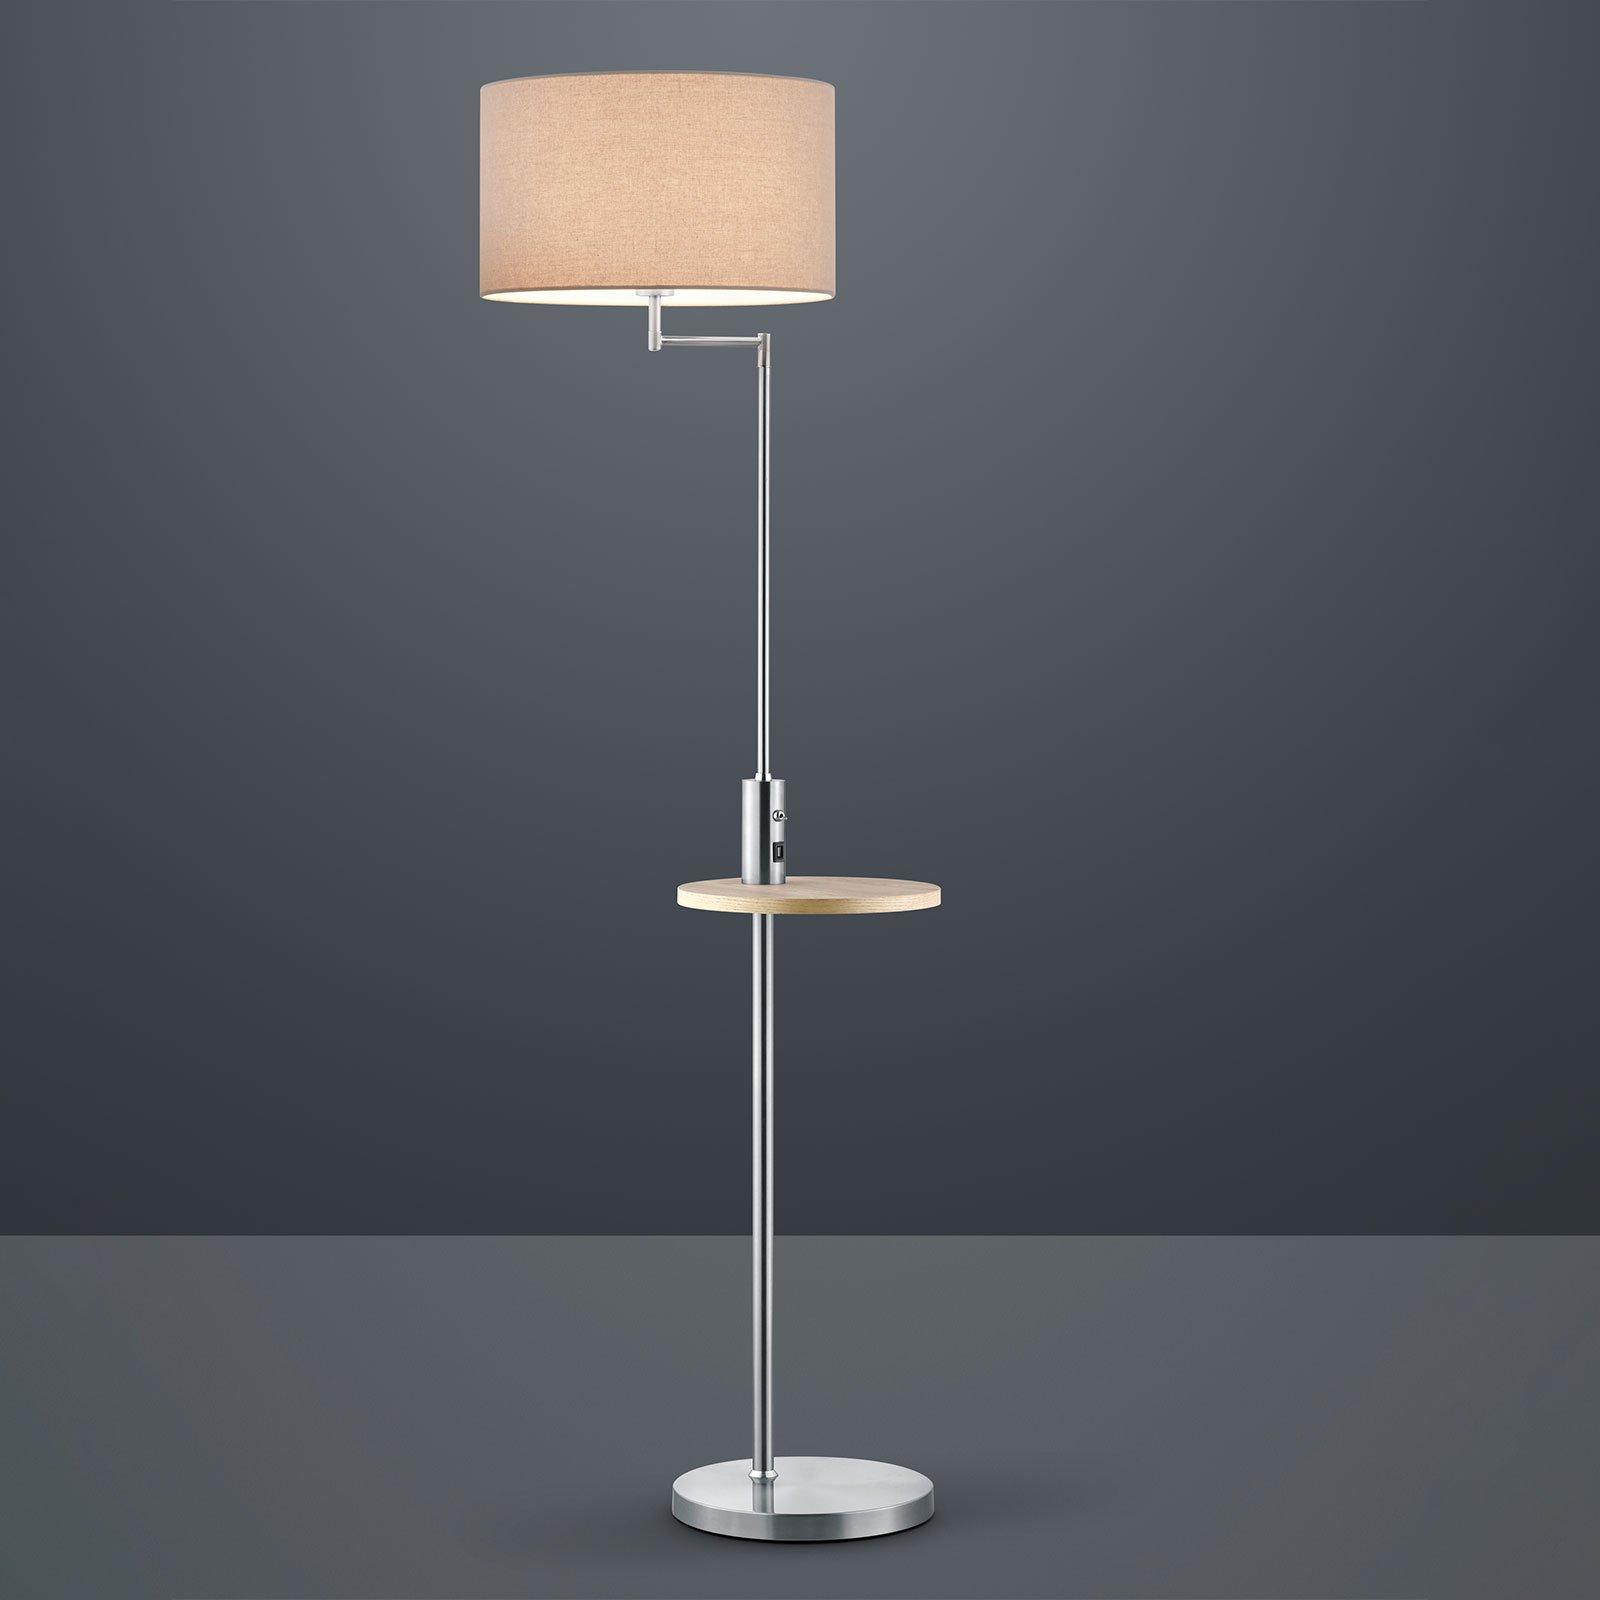 Gulvlampe Claas, hylle, USB-port, nikkel